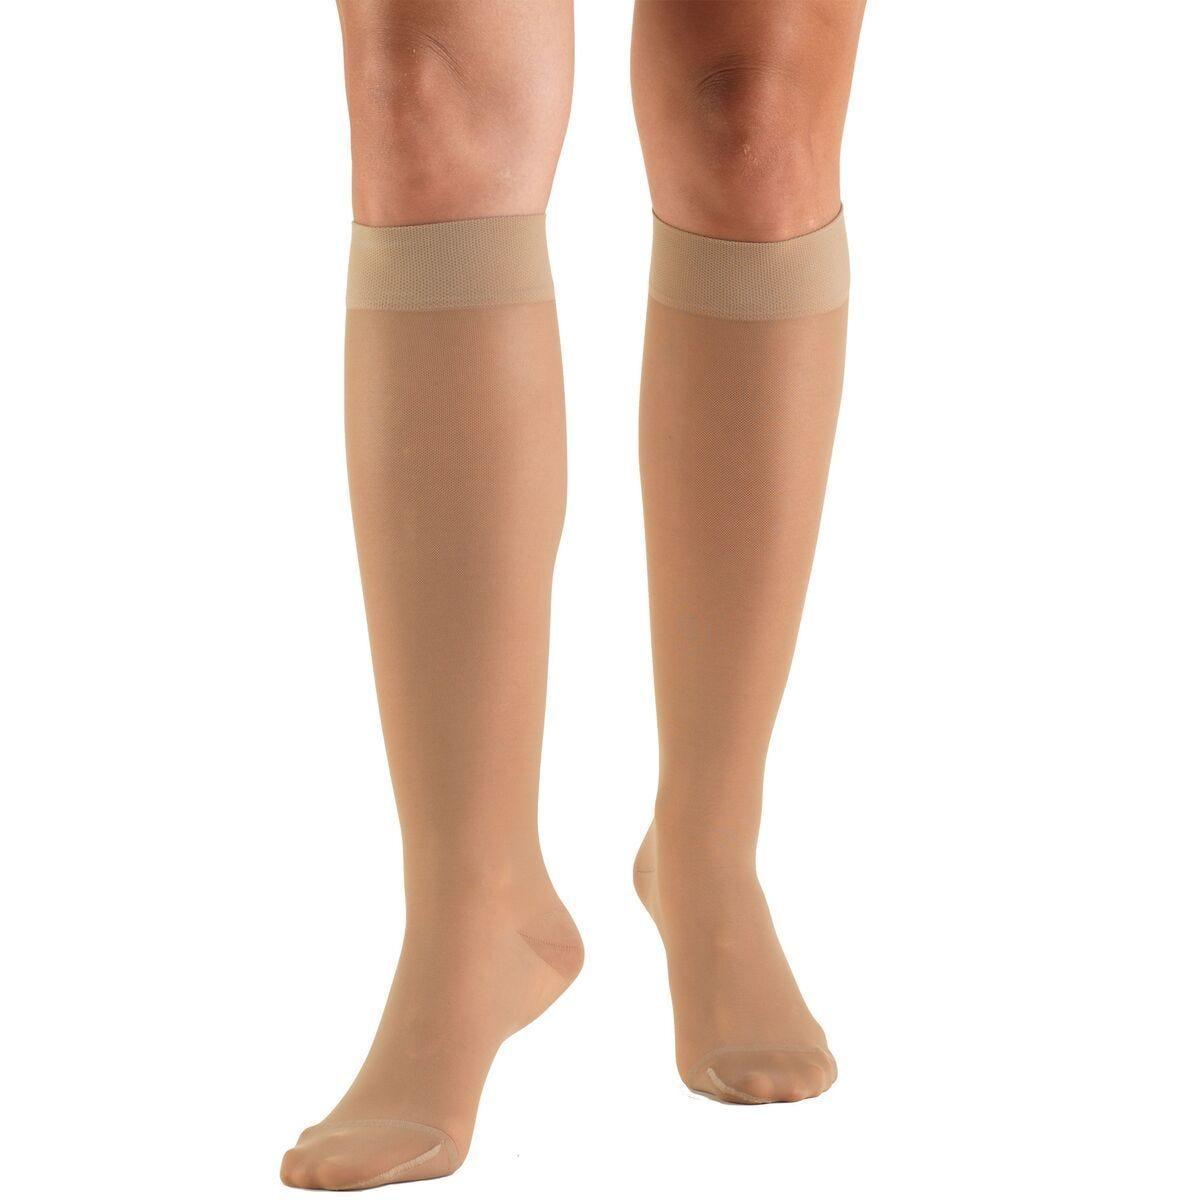 20-30mmHg Compression Stockings. Knee High Compression Socks for Men /& Women.